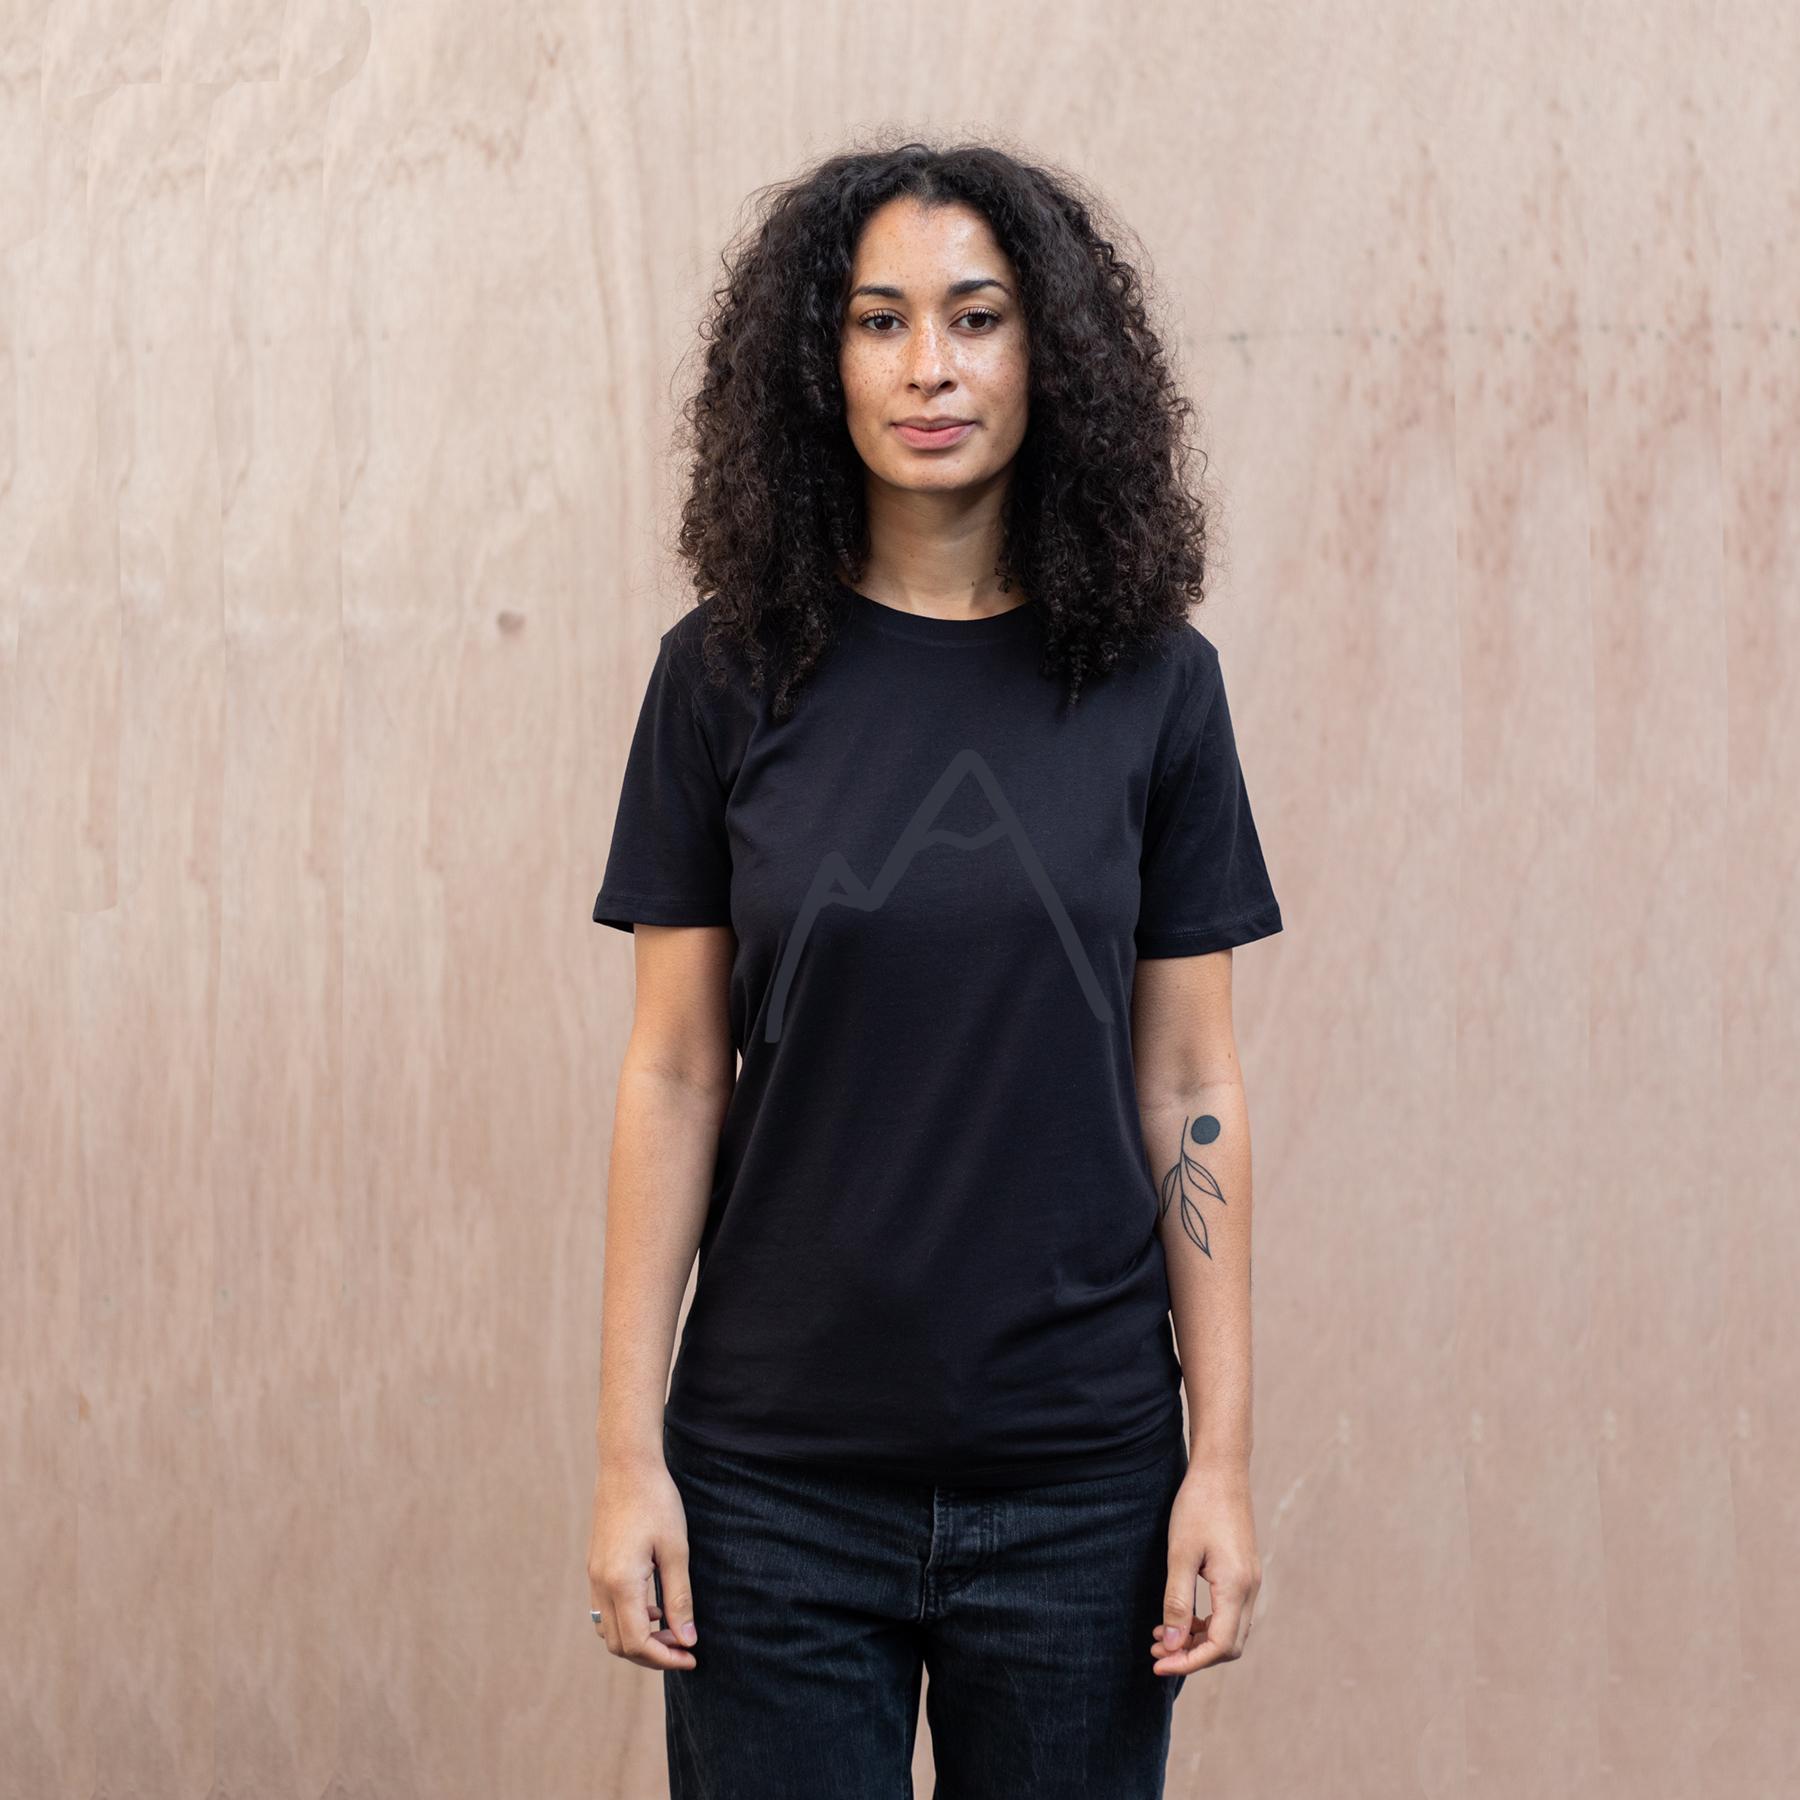 Simple-Mountain-Stargazer-organic-t-shirt-black-The-Level-Collective.jpg